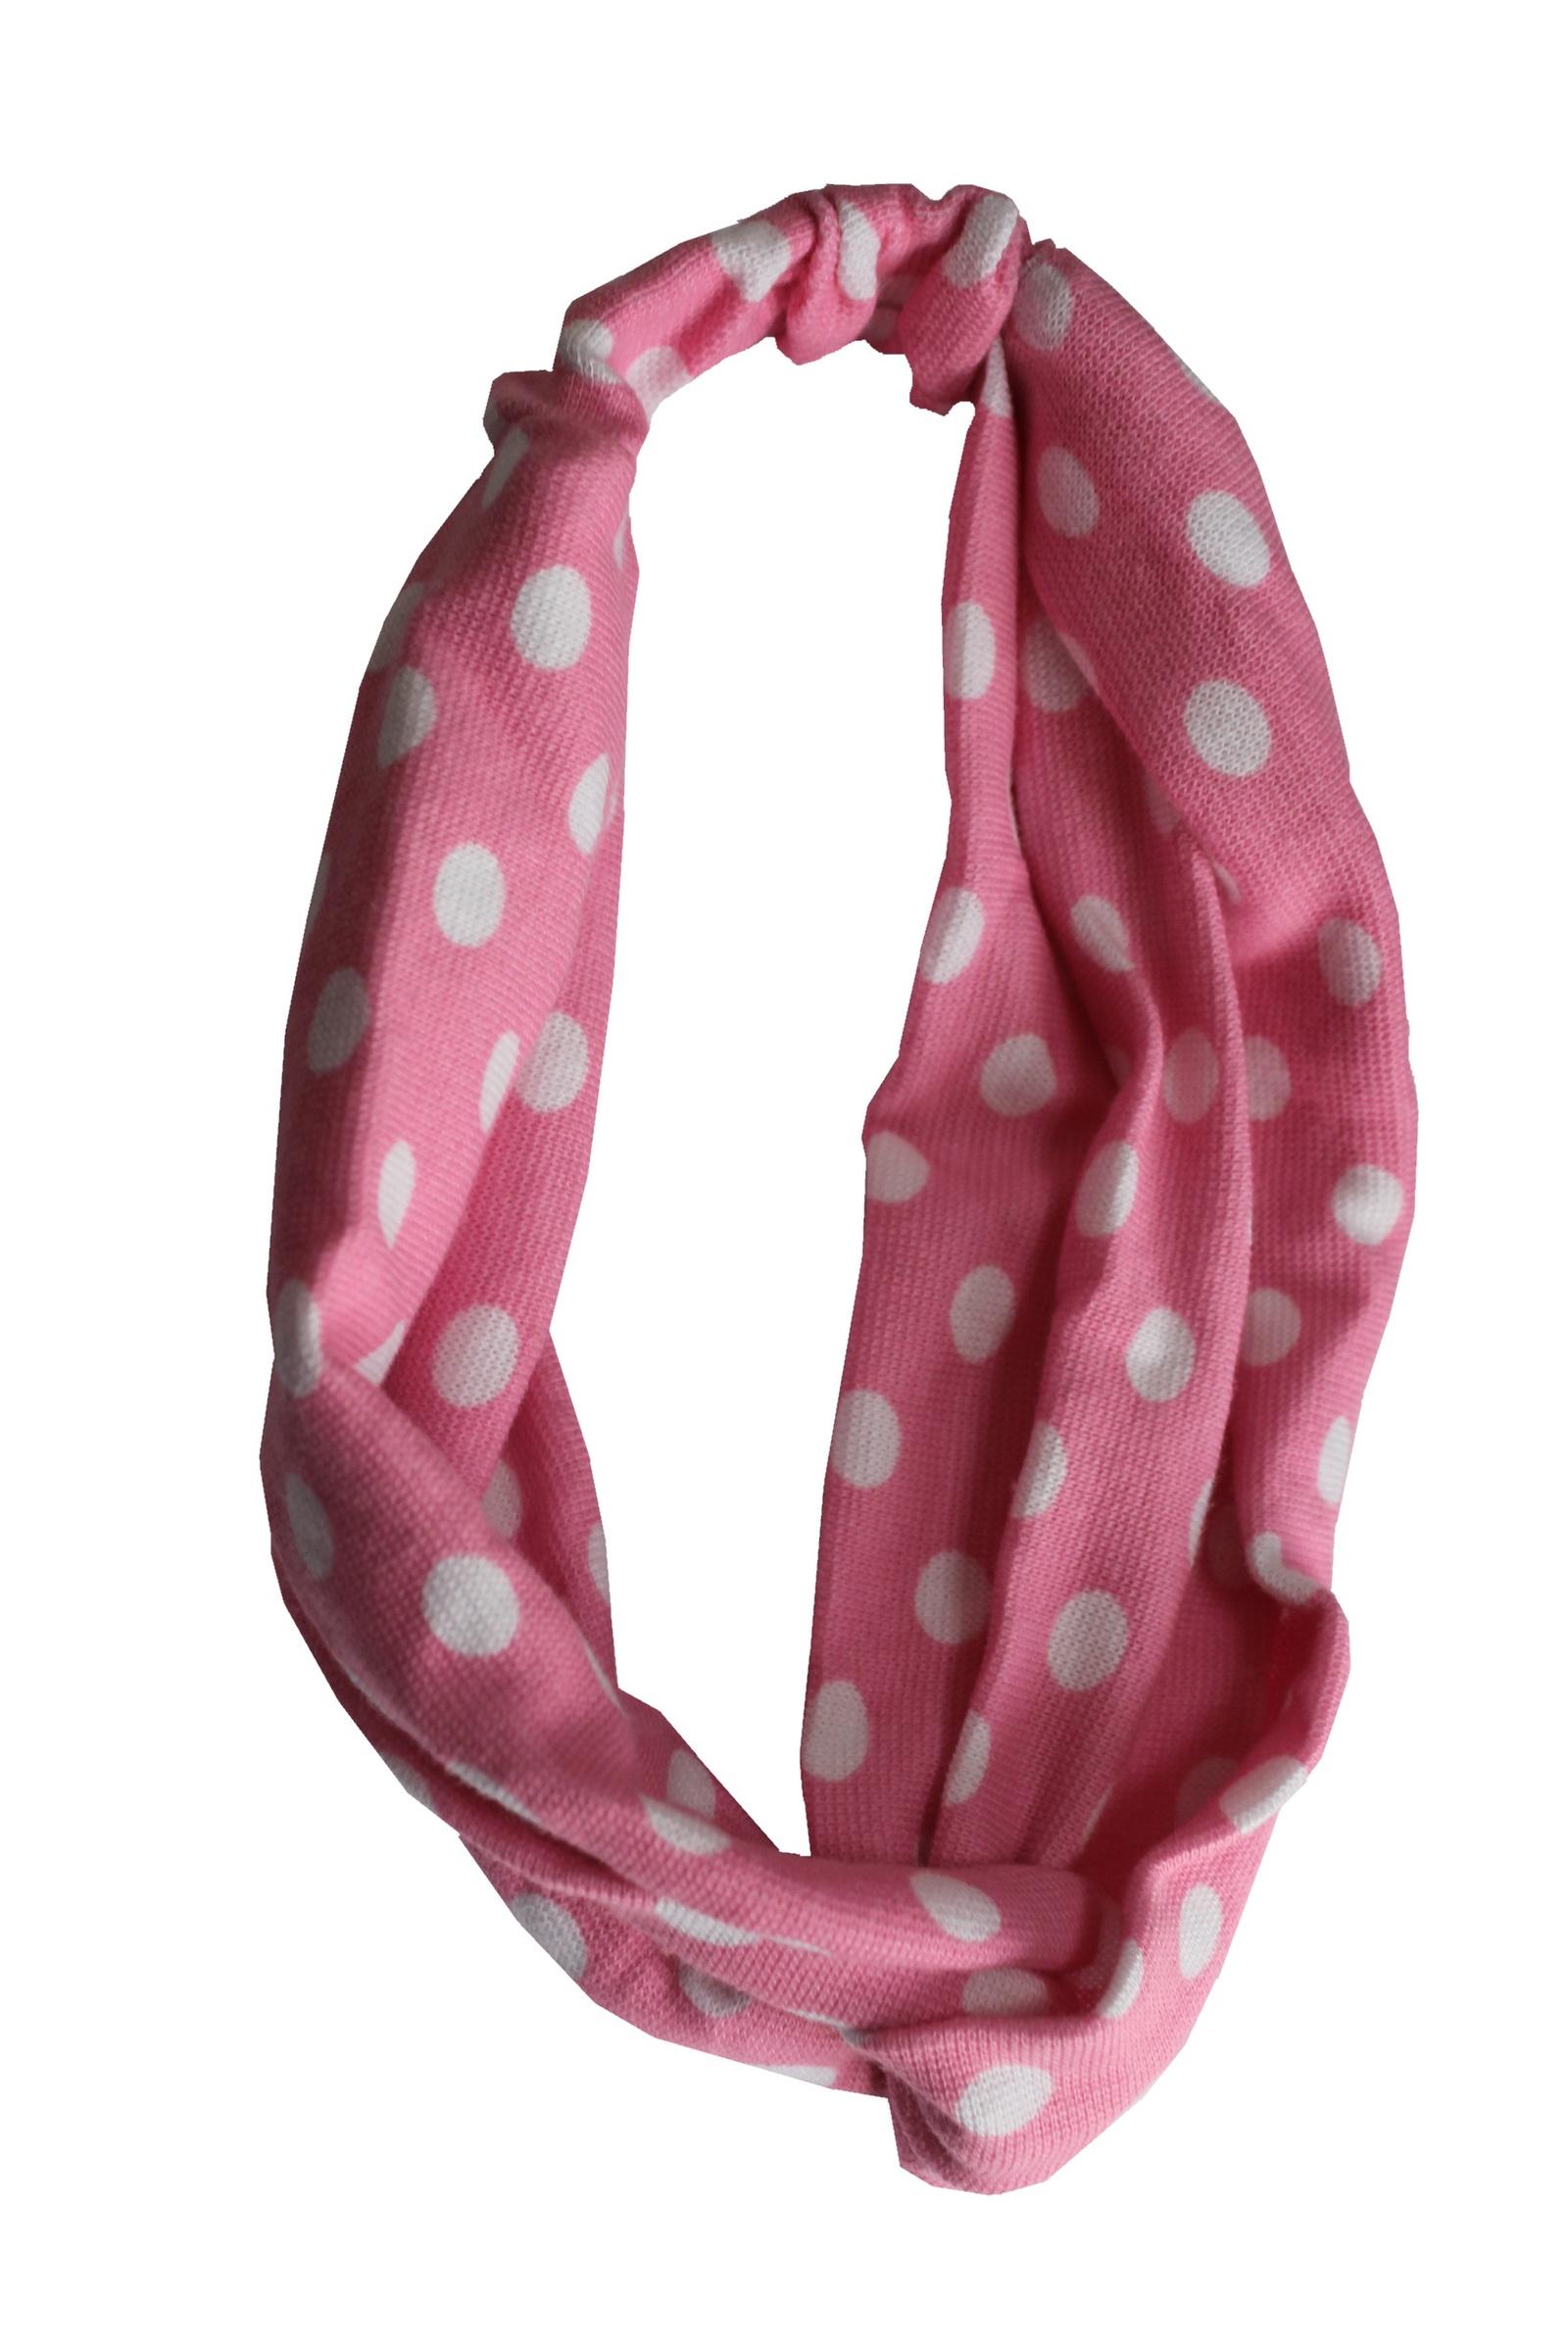 Повязка на голову Ideal повязка на голову для младенца baby s joy цвет бежевый k 22